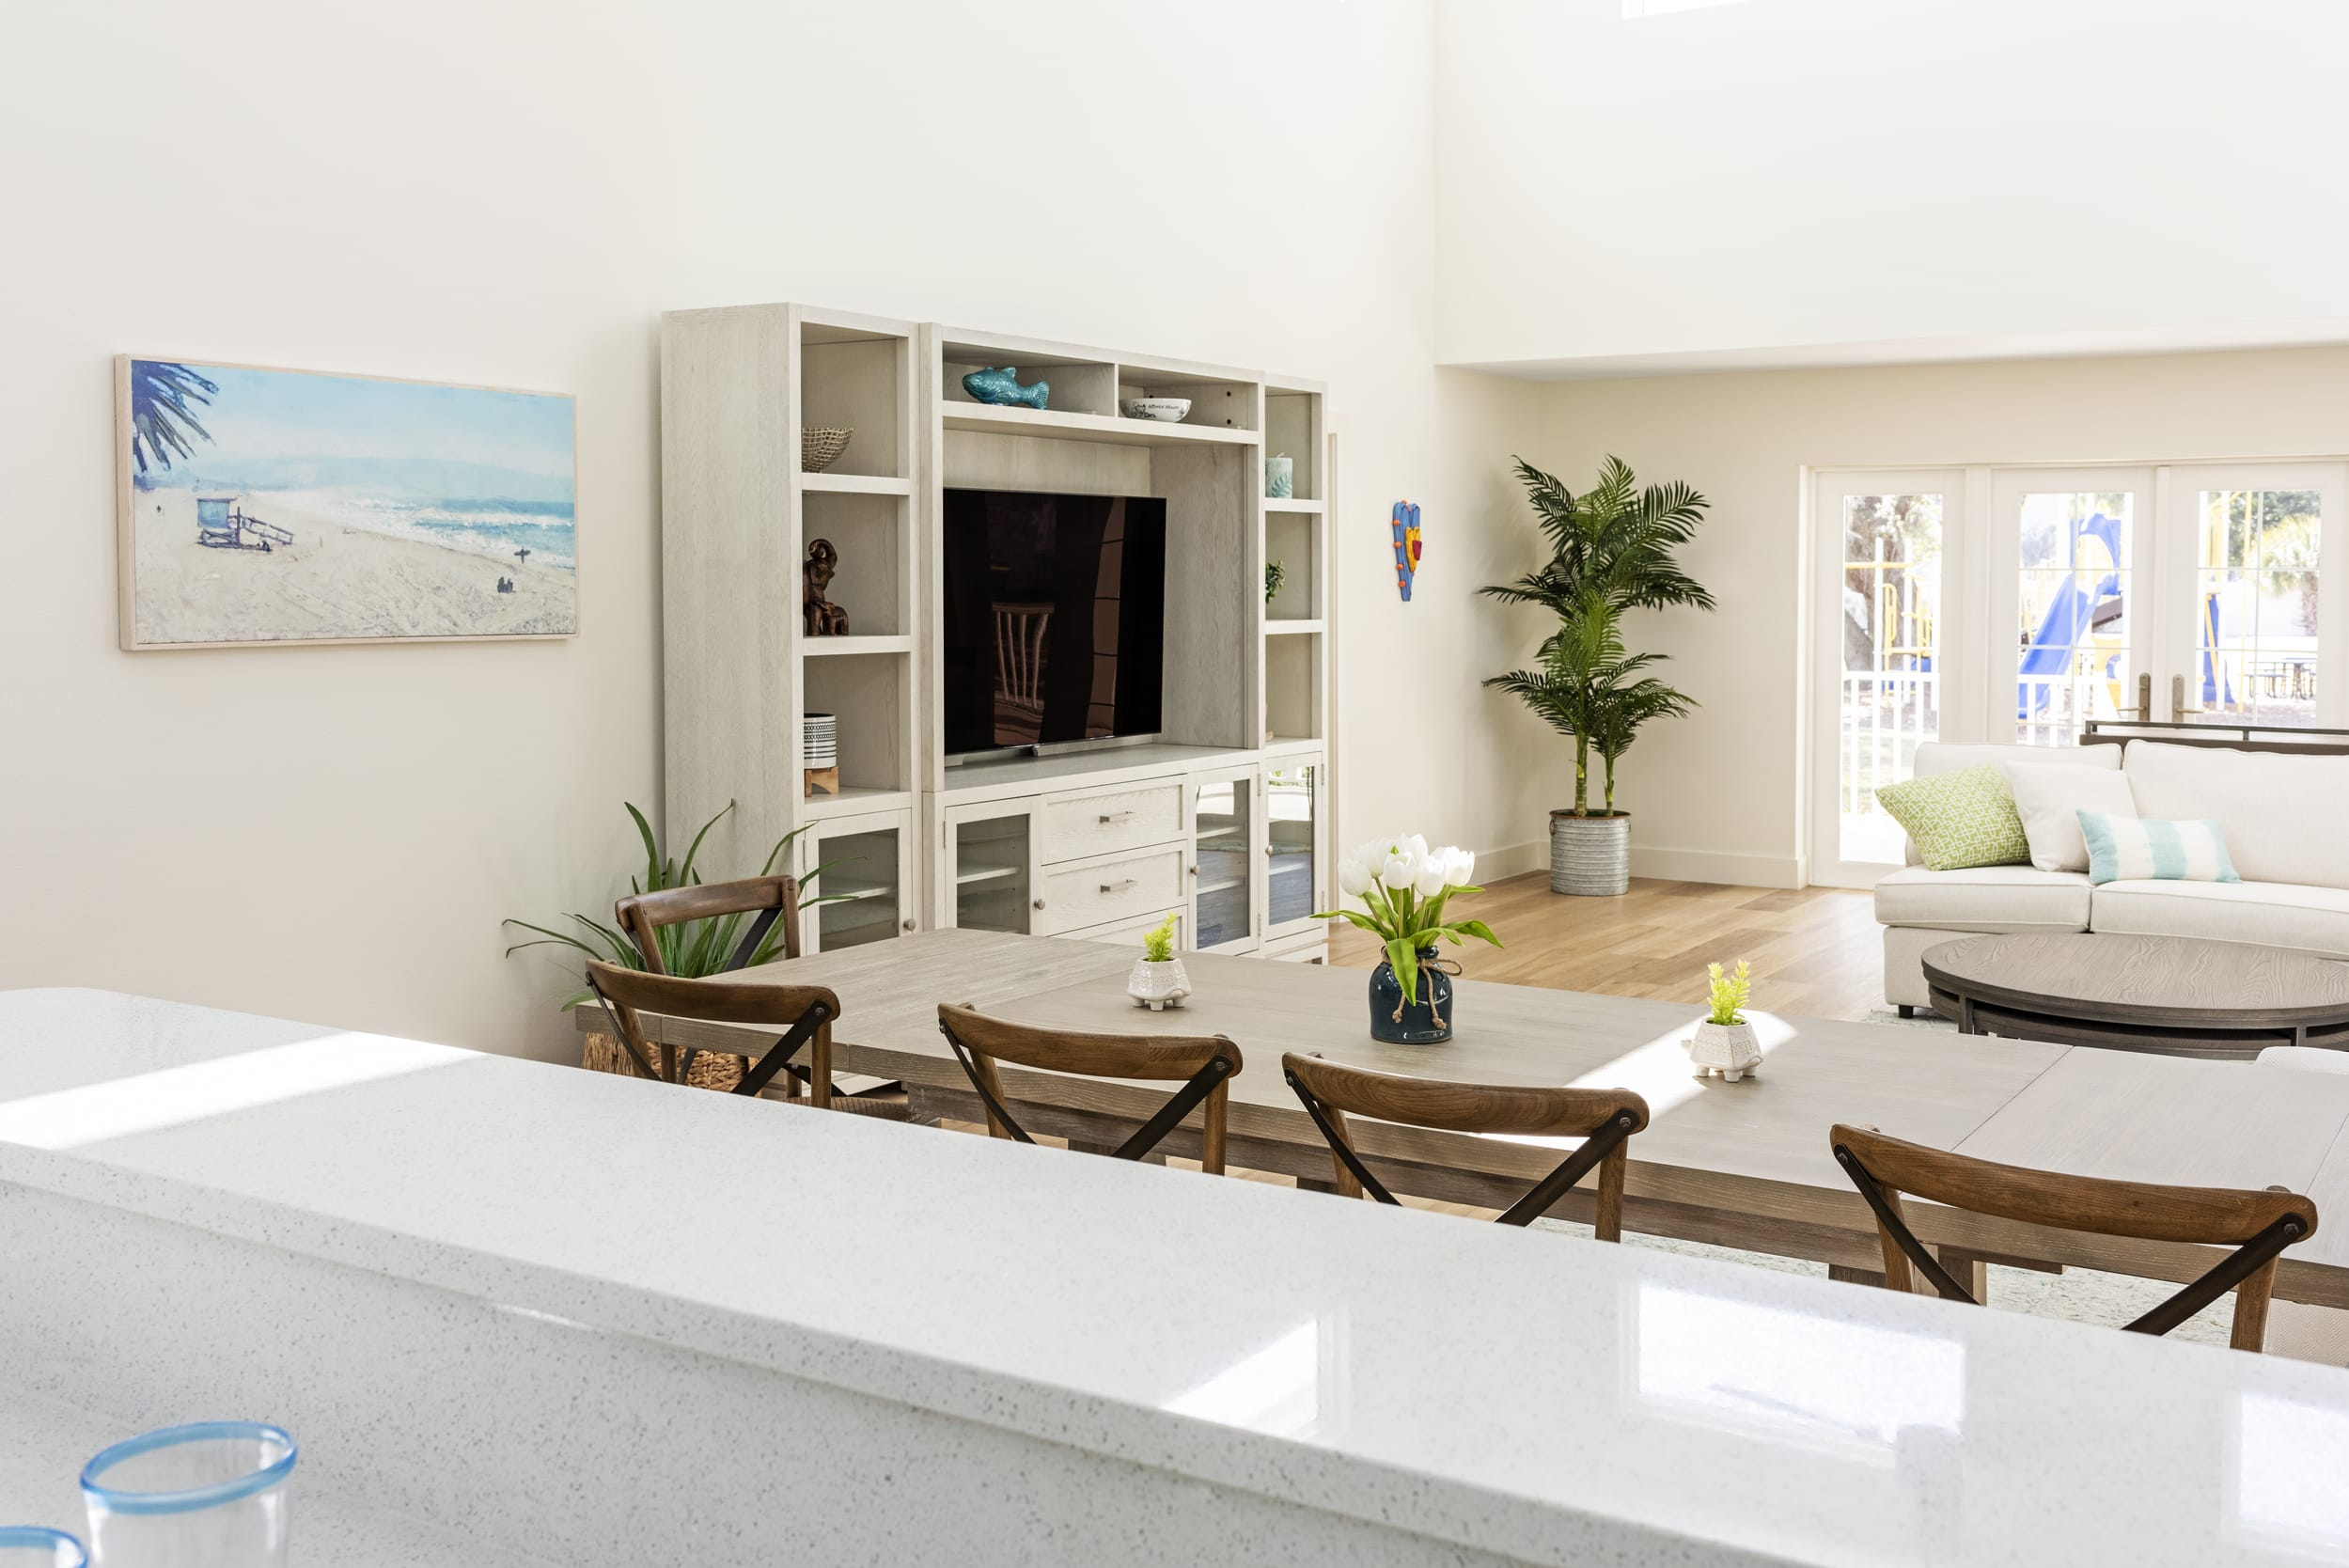 Wood Dinning Table Floors White Tulips Entertainment Center